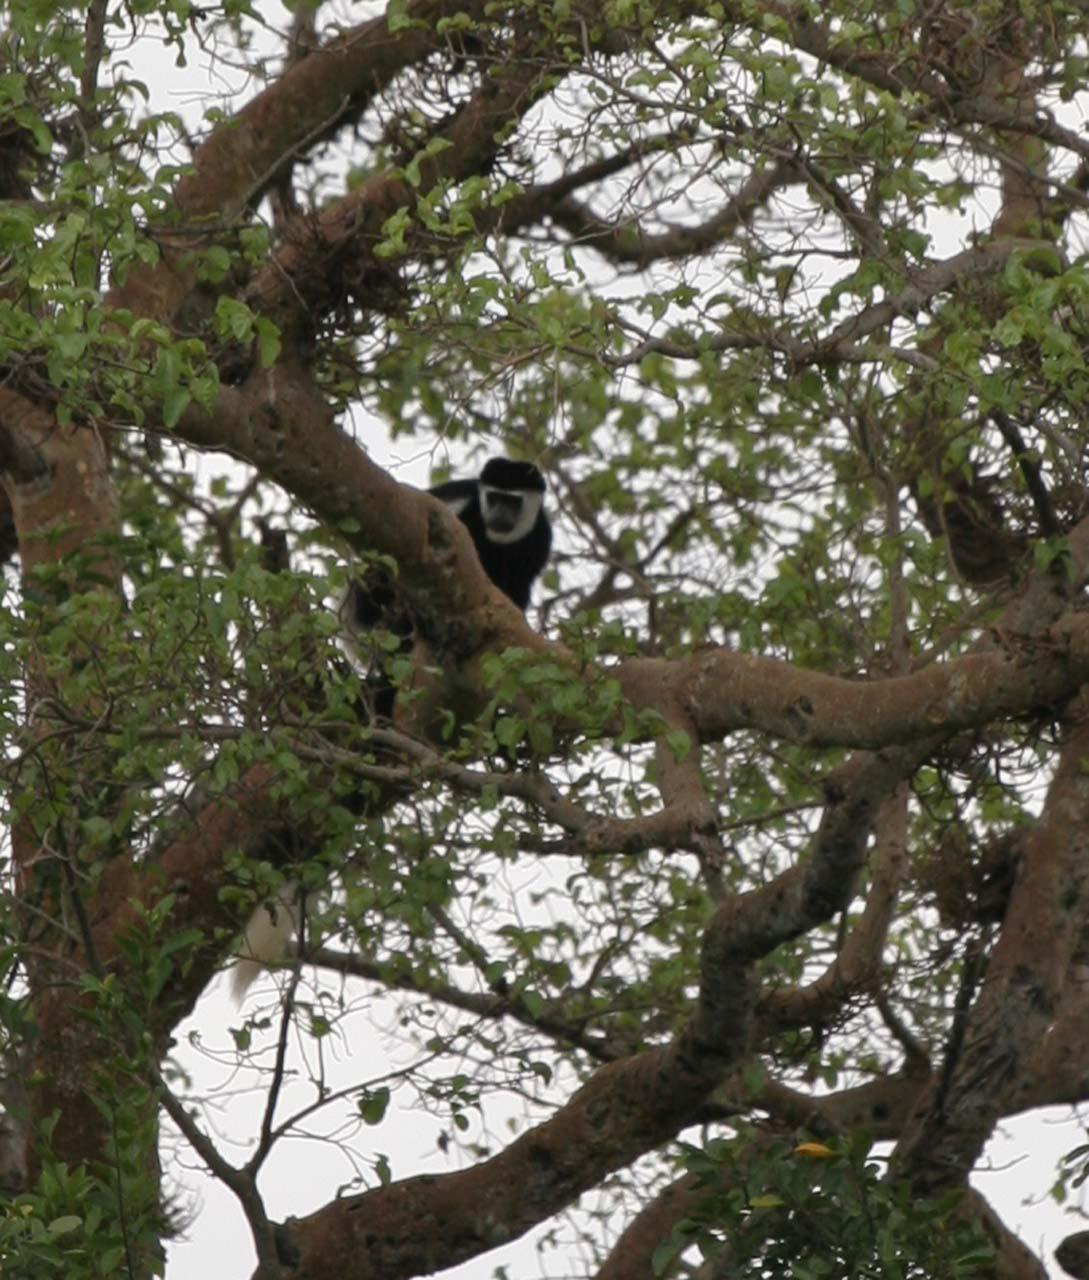 A rare colobus monkey